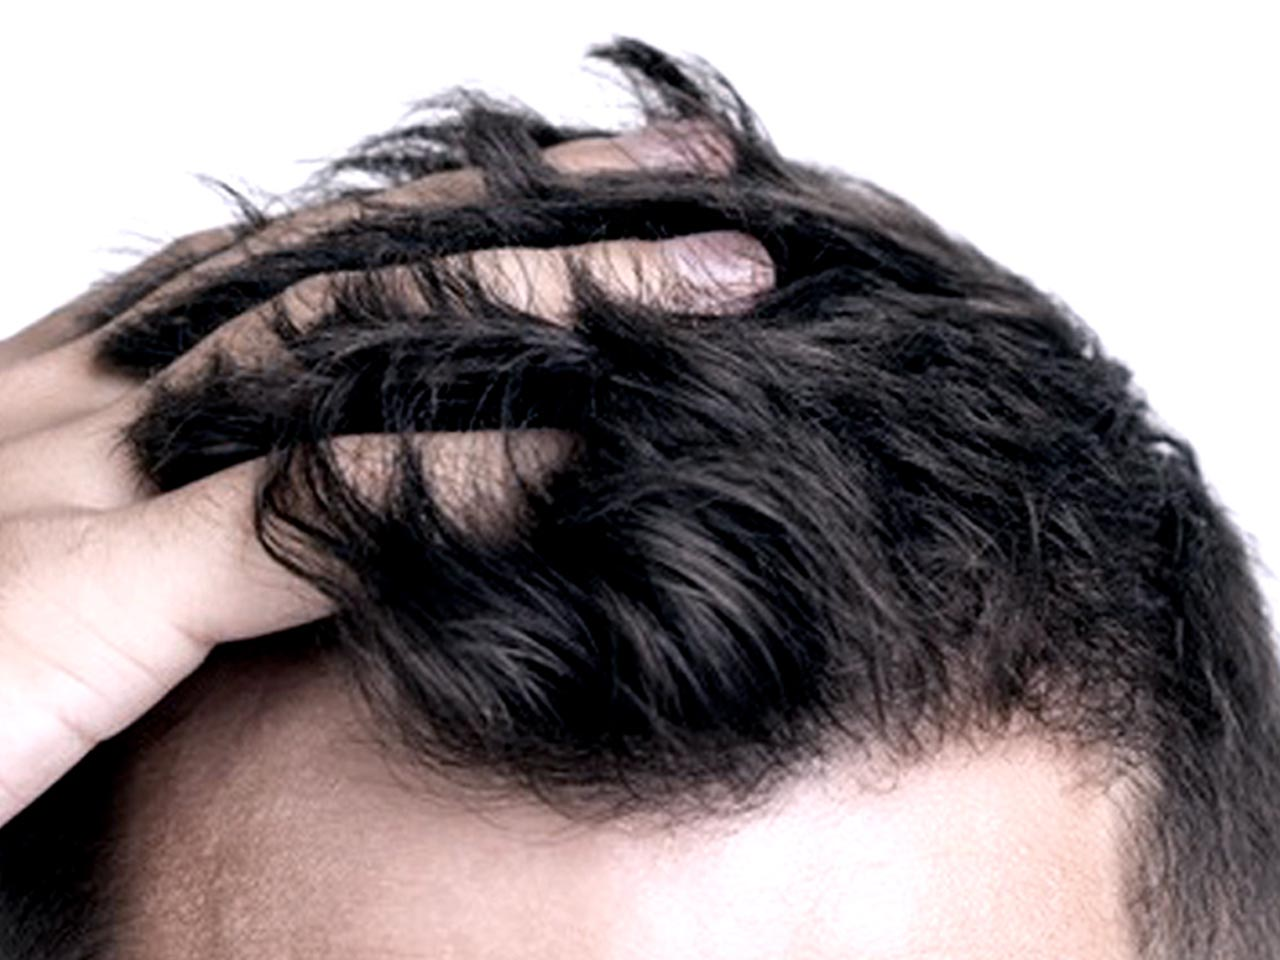 HAIR FILLER INJECTION